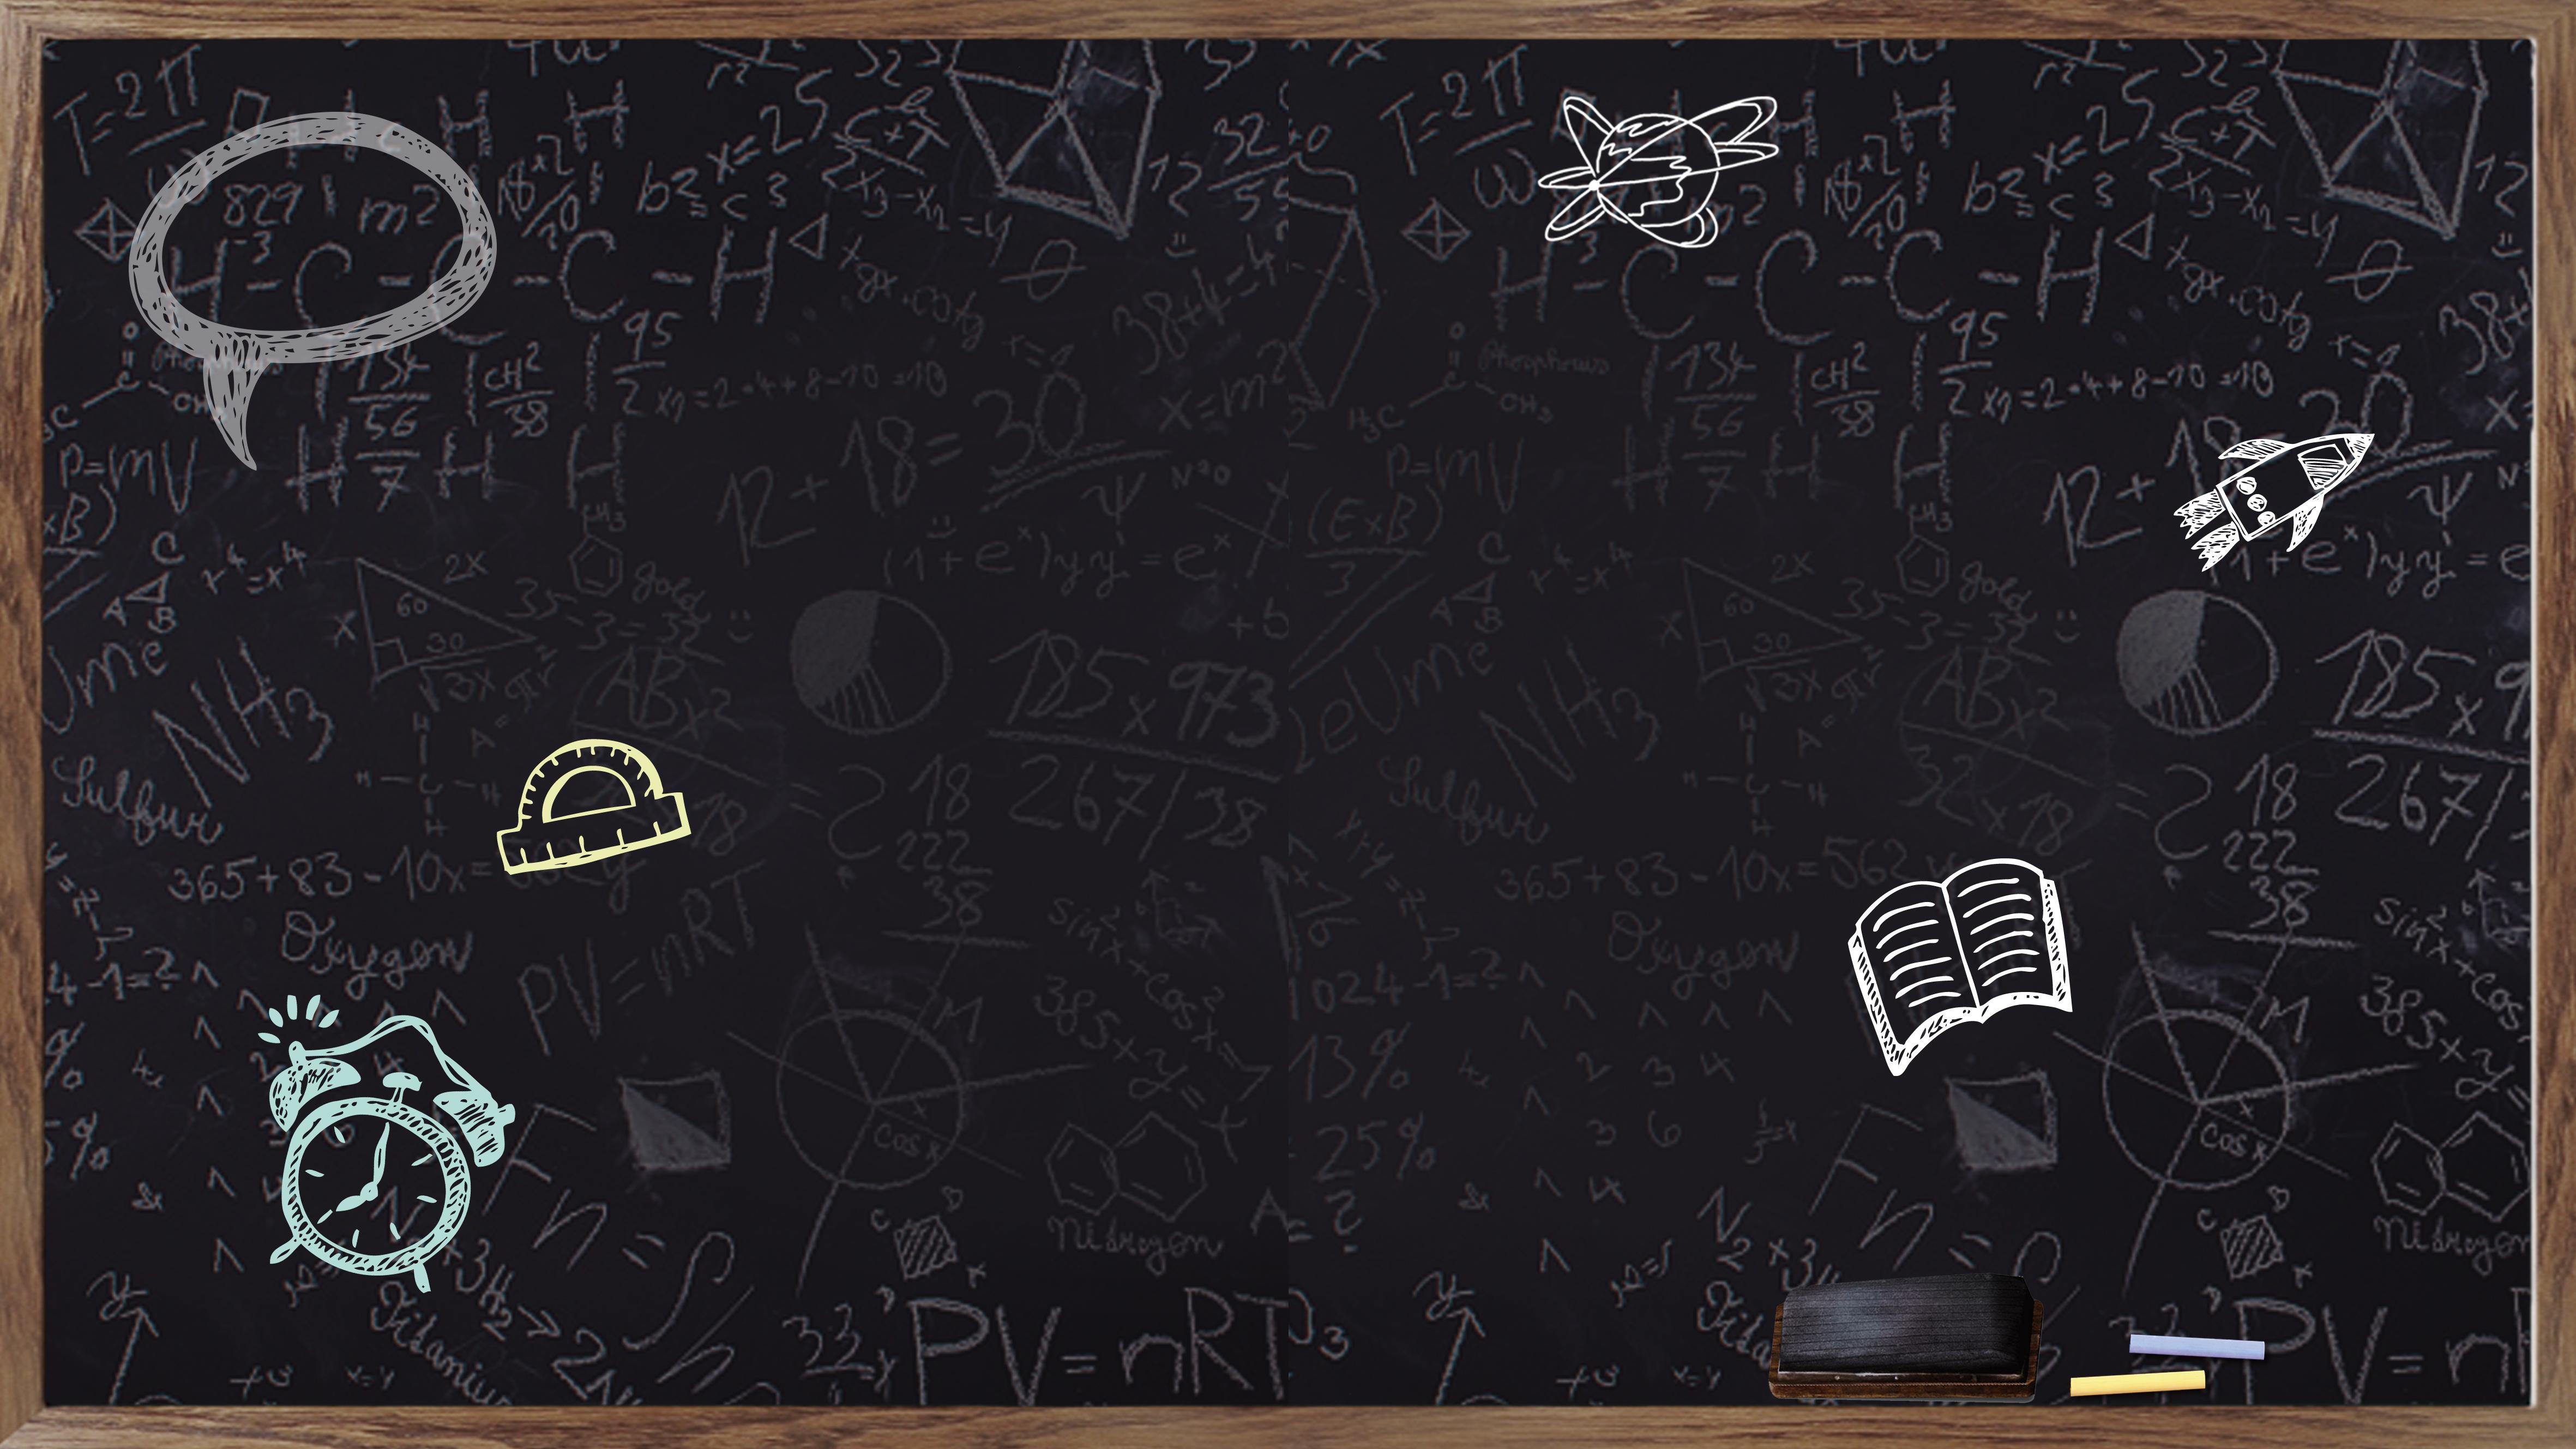 Картинка на черном фоне в школу слово поперек